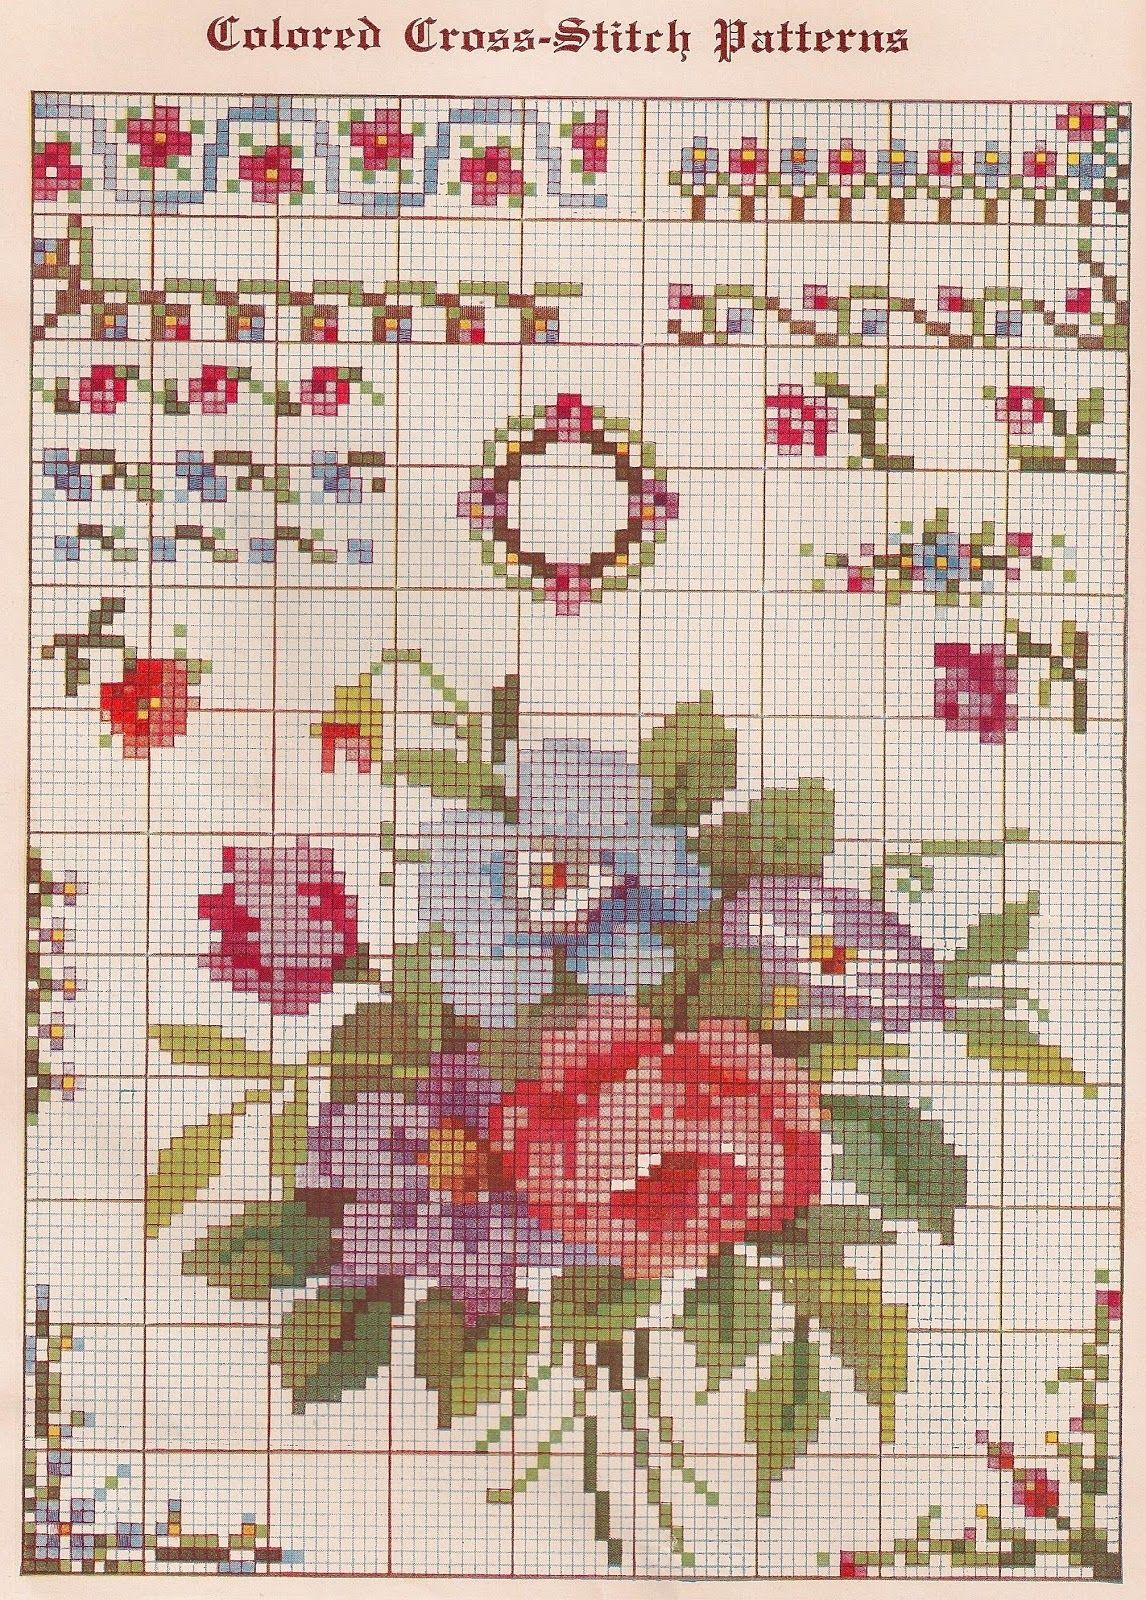 Cross Stitch Patterns Free Printable | Sentimental Baby: Free - Free Printable Cross Stitch Patterns Flowers